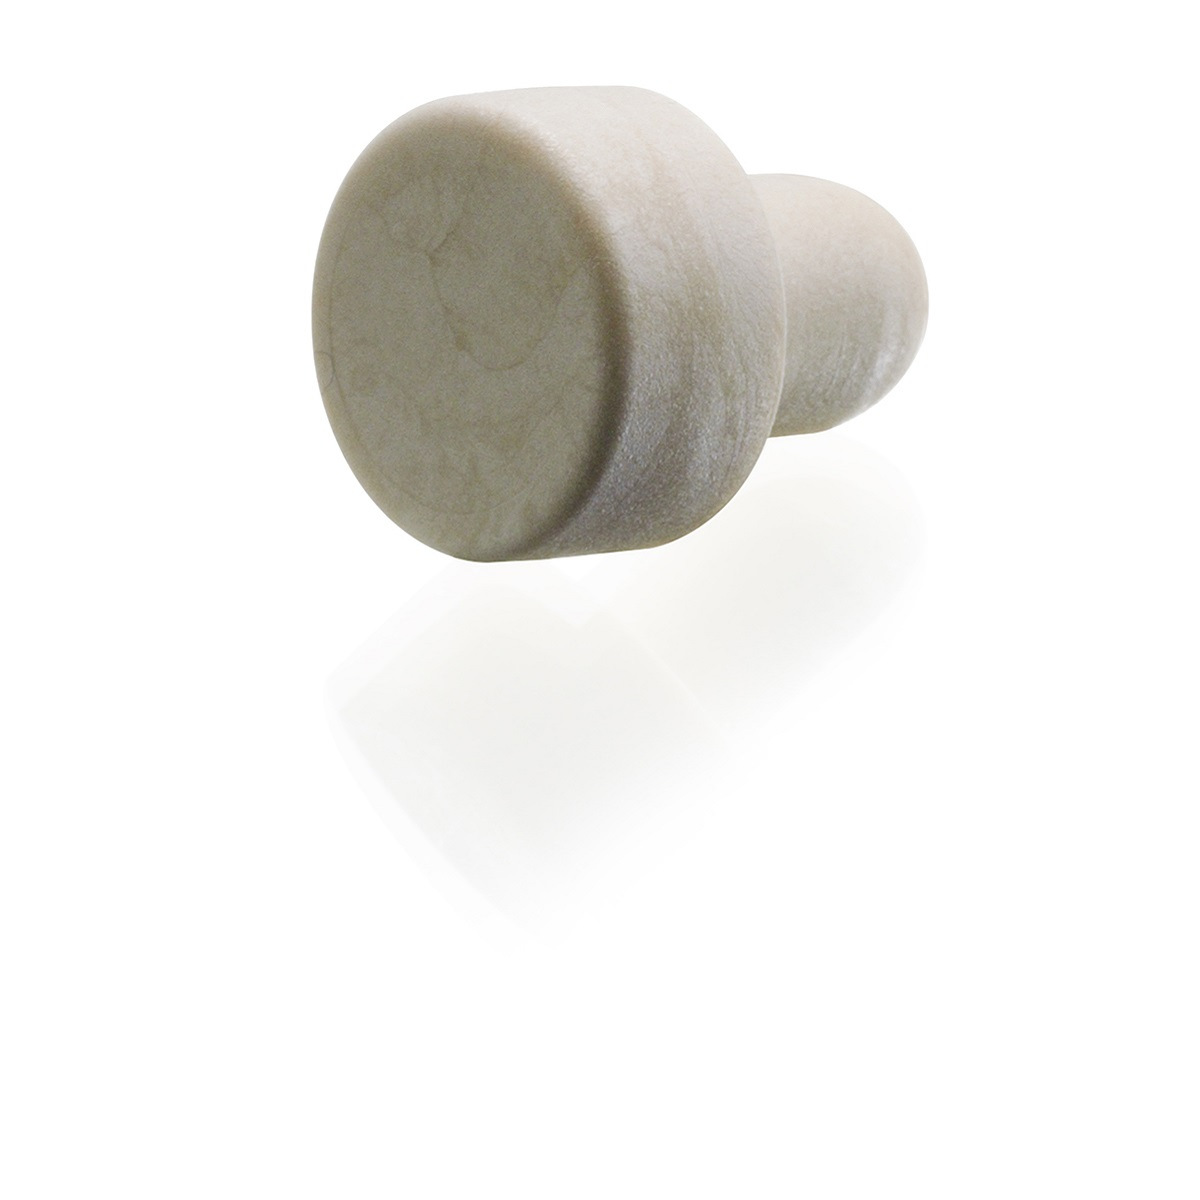 thetis pack πώμα συνθετικό ξύλινη κεφαλή καπάκια φελλός synthetic cap